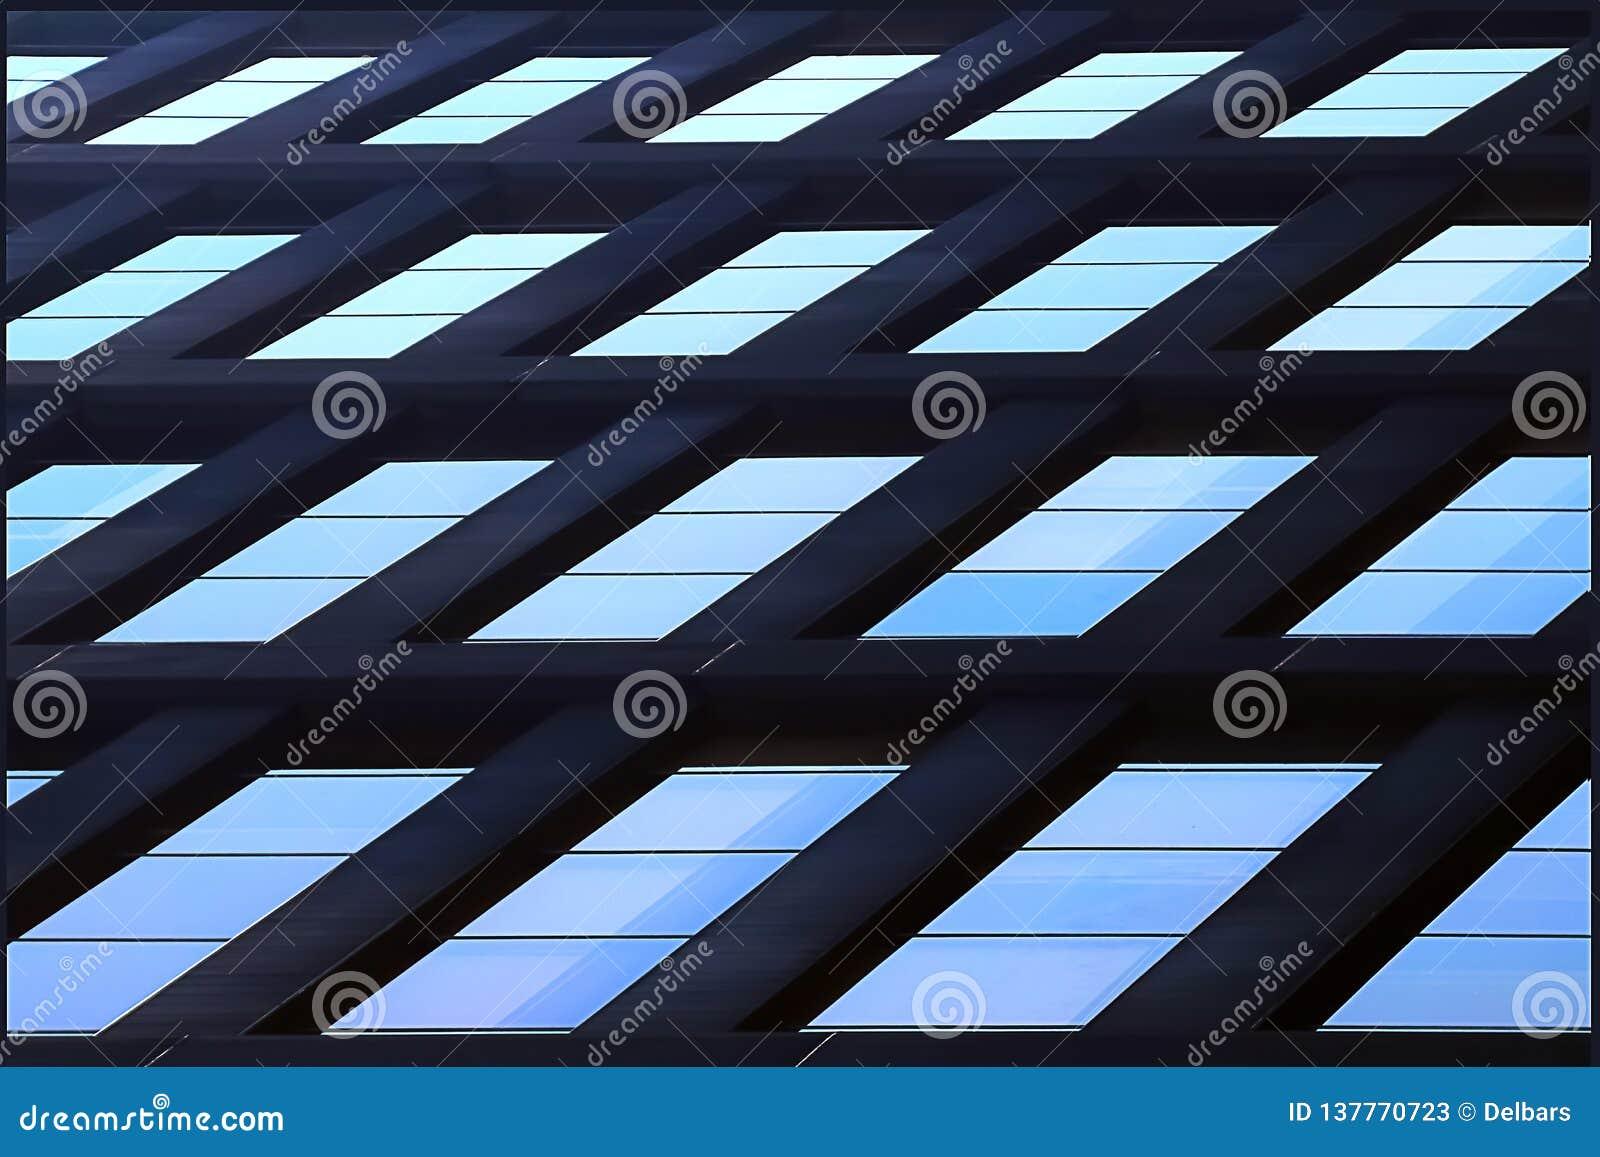 Geometric architectural background of blue. Skyscraper glass windows.